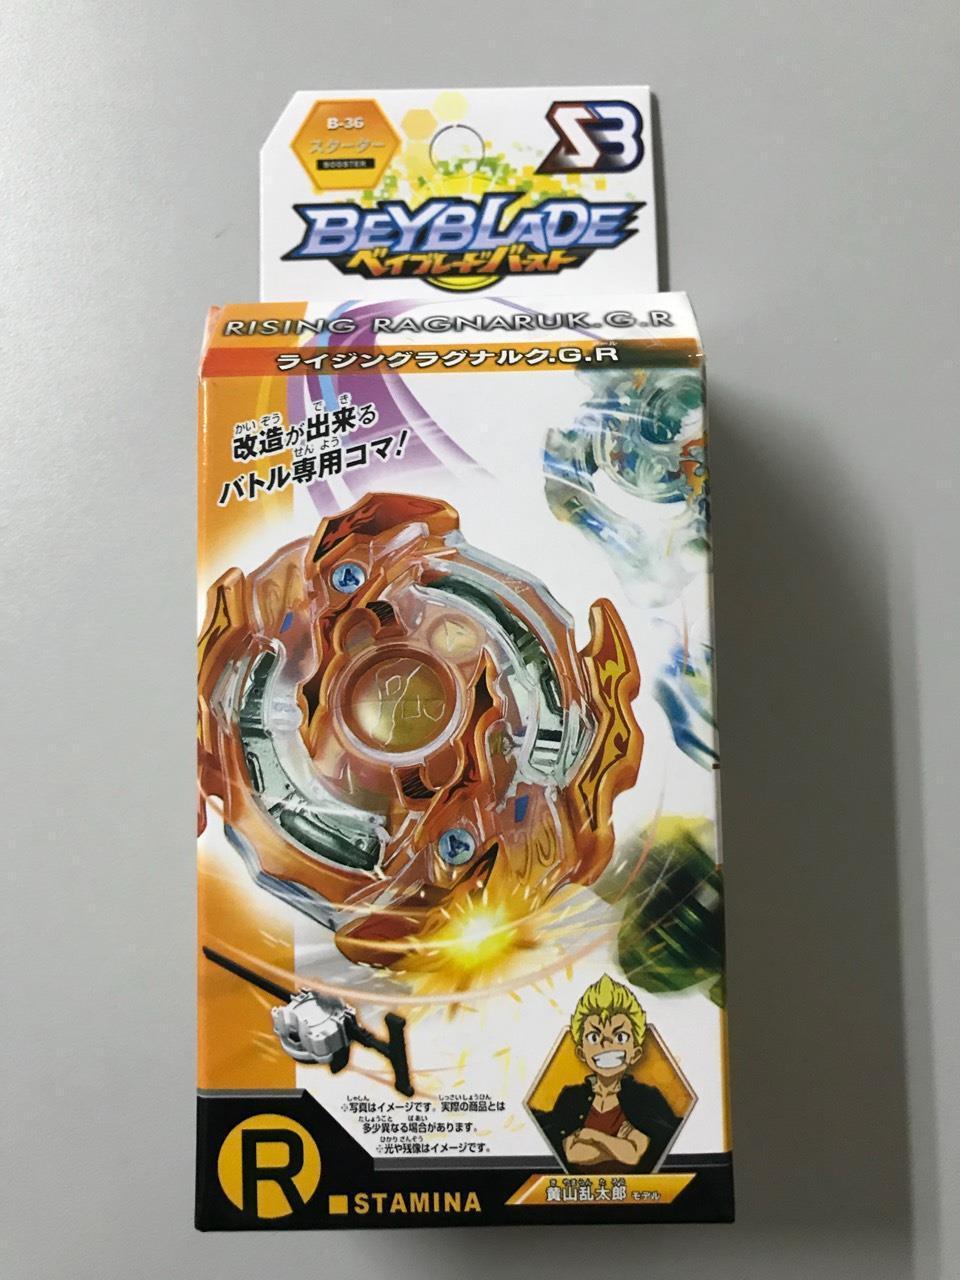 Бейблейд Blade/ бейблейд/beyblade Rising Ragnaruk (Stamina)  с  механизмом для запуска желтый